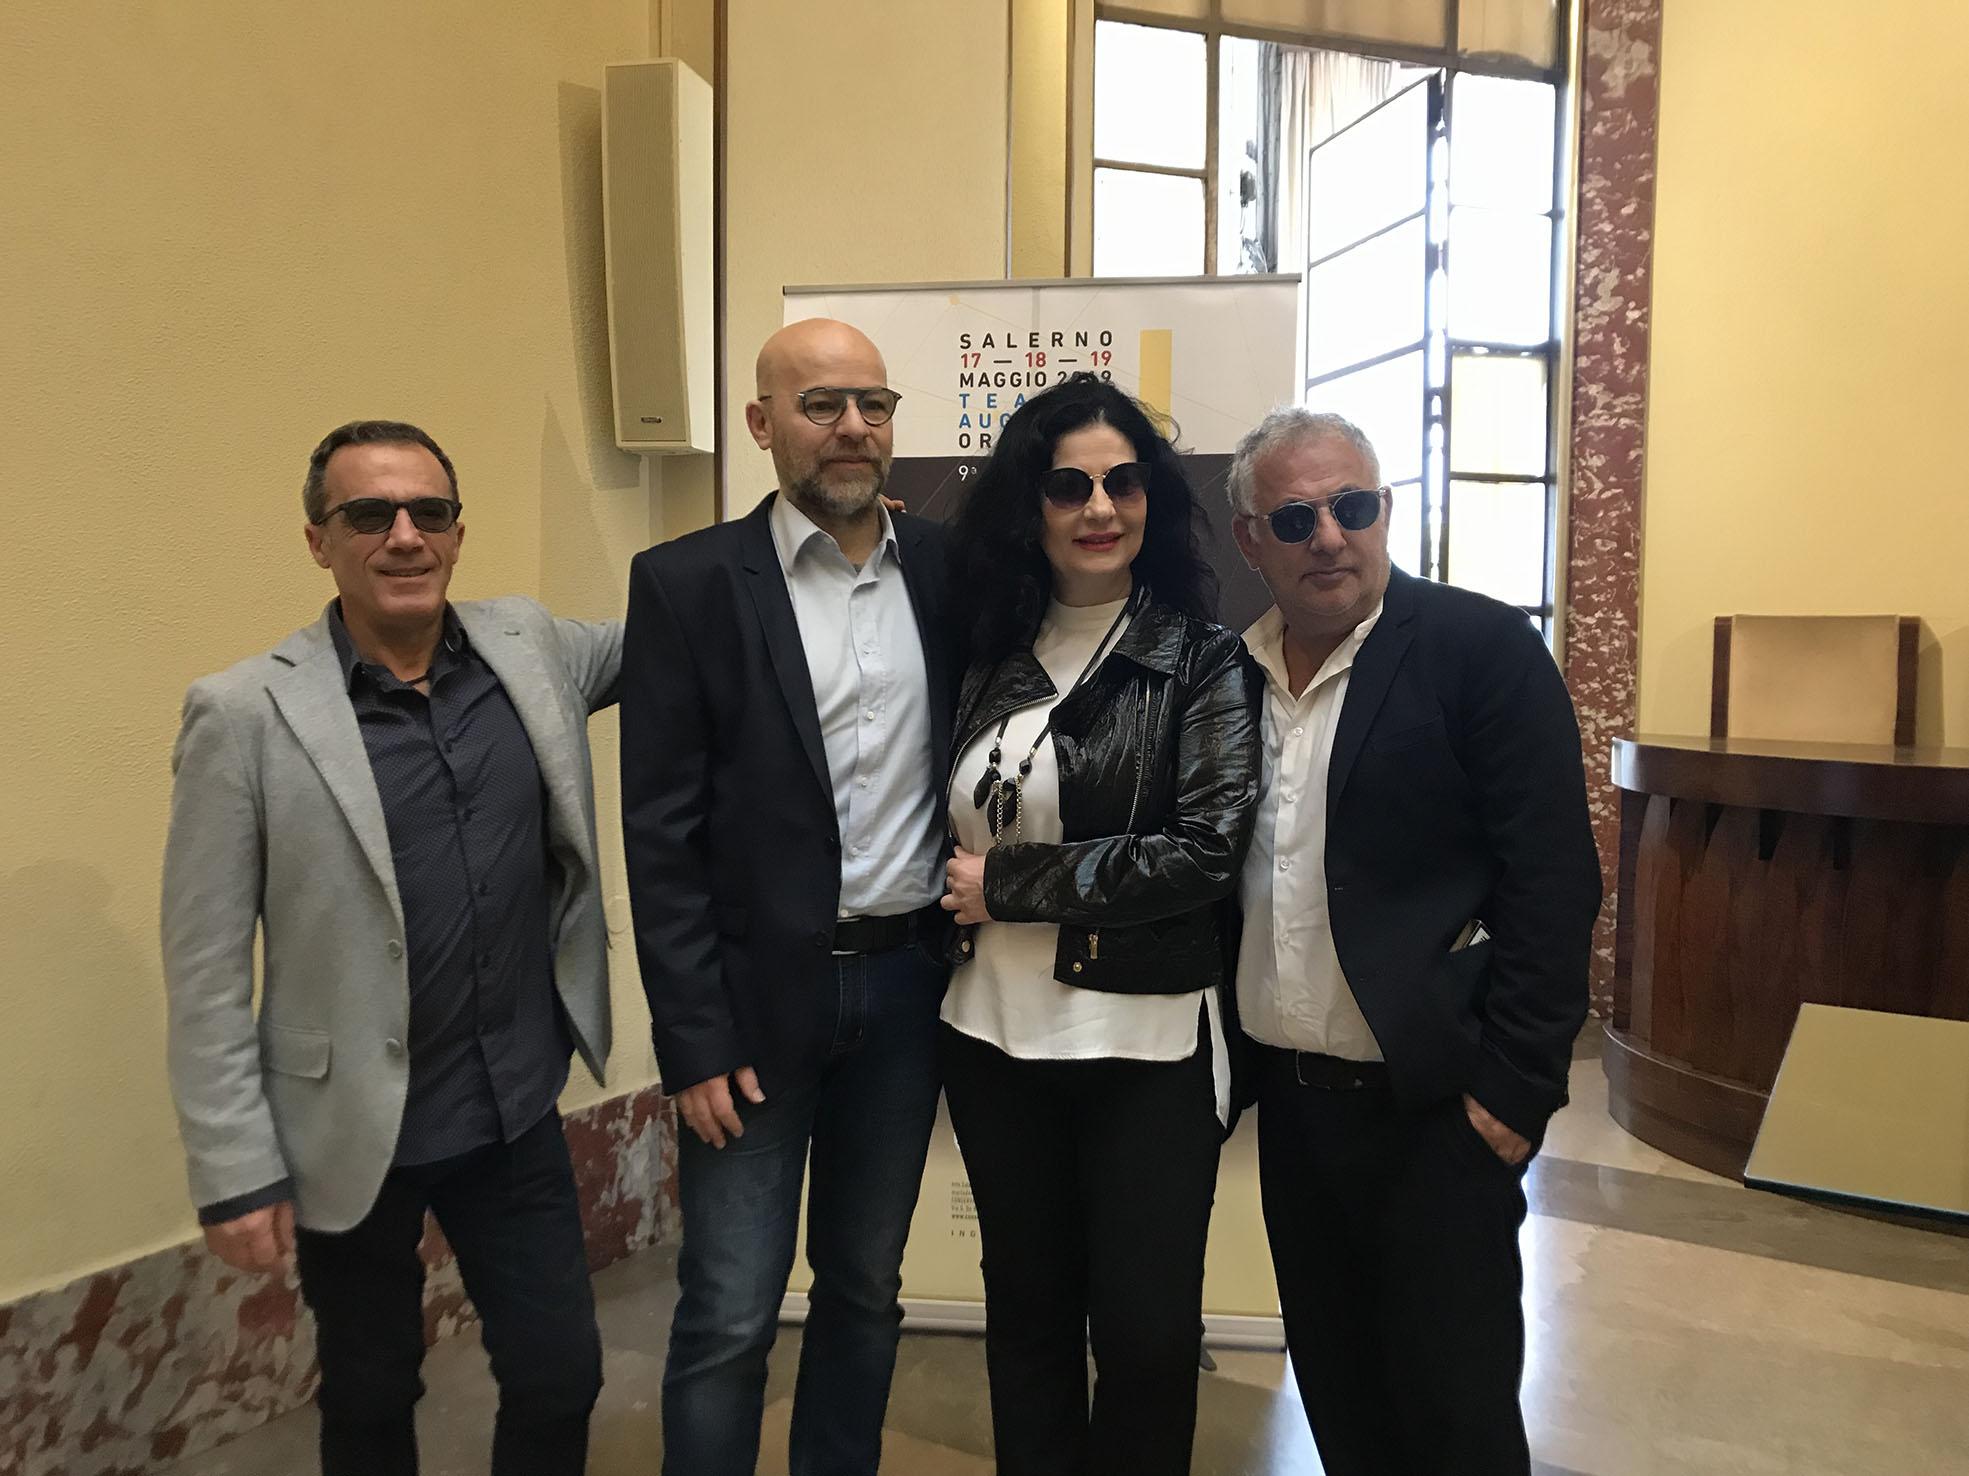 Salerno: Il teatro Augusteo ospita il Salerno Jazz & Pop festival